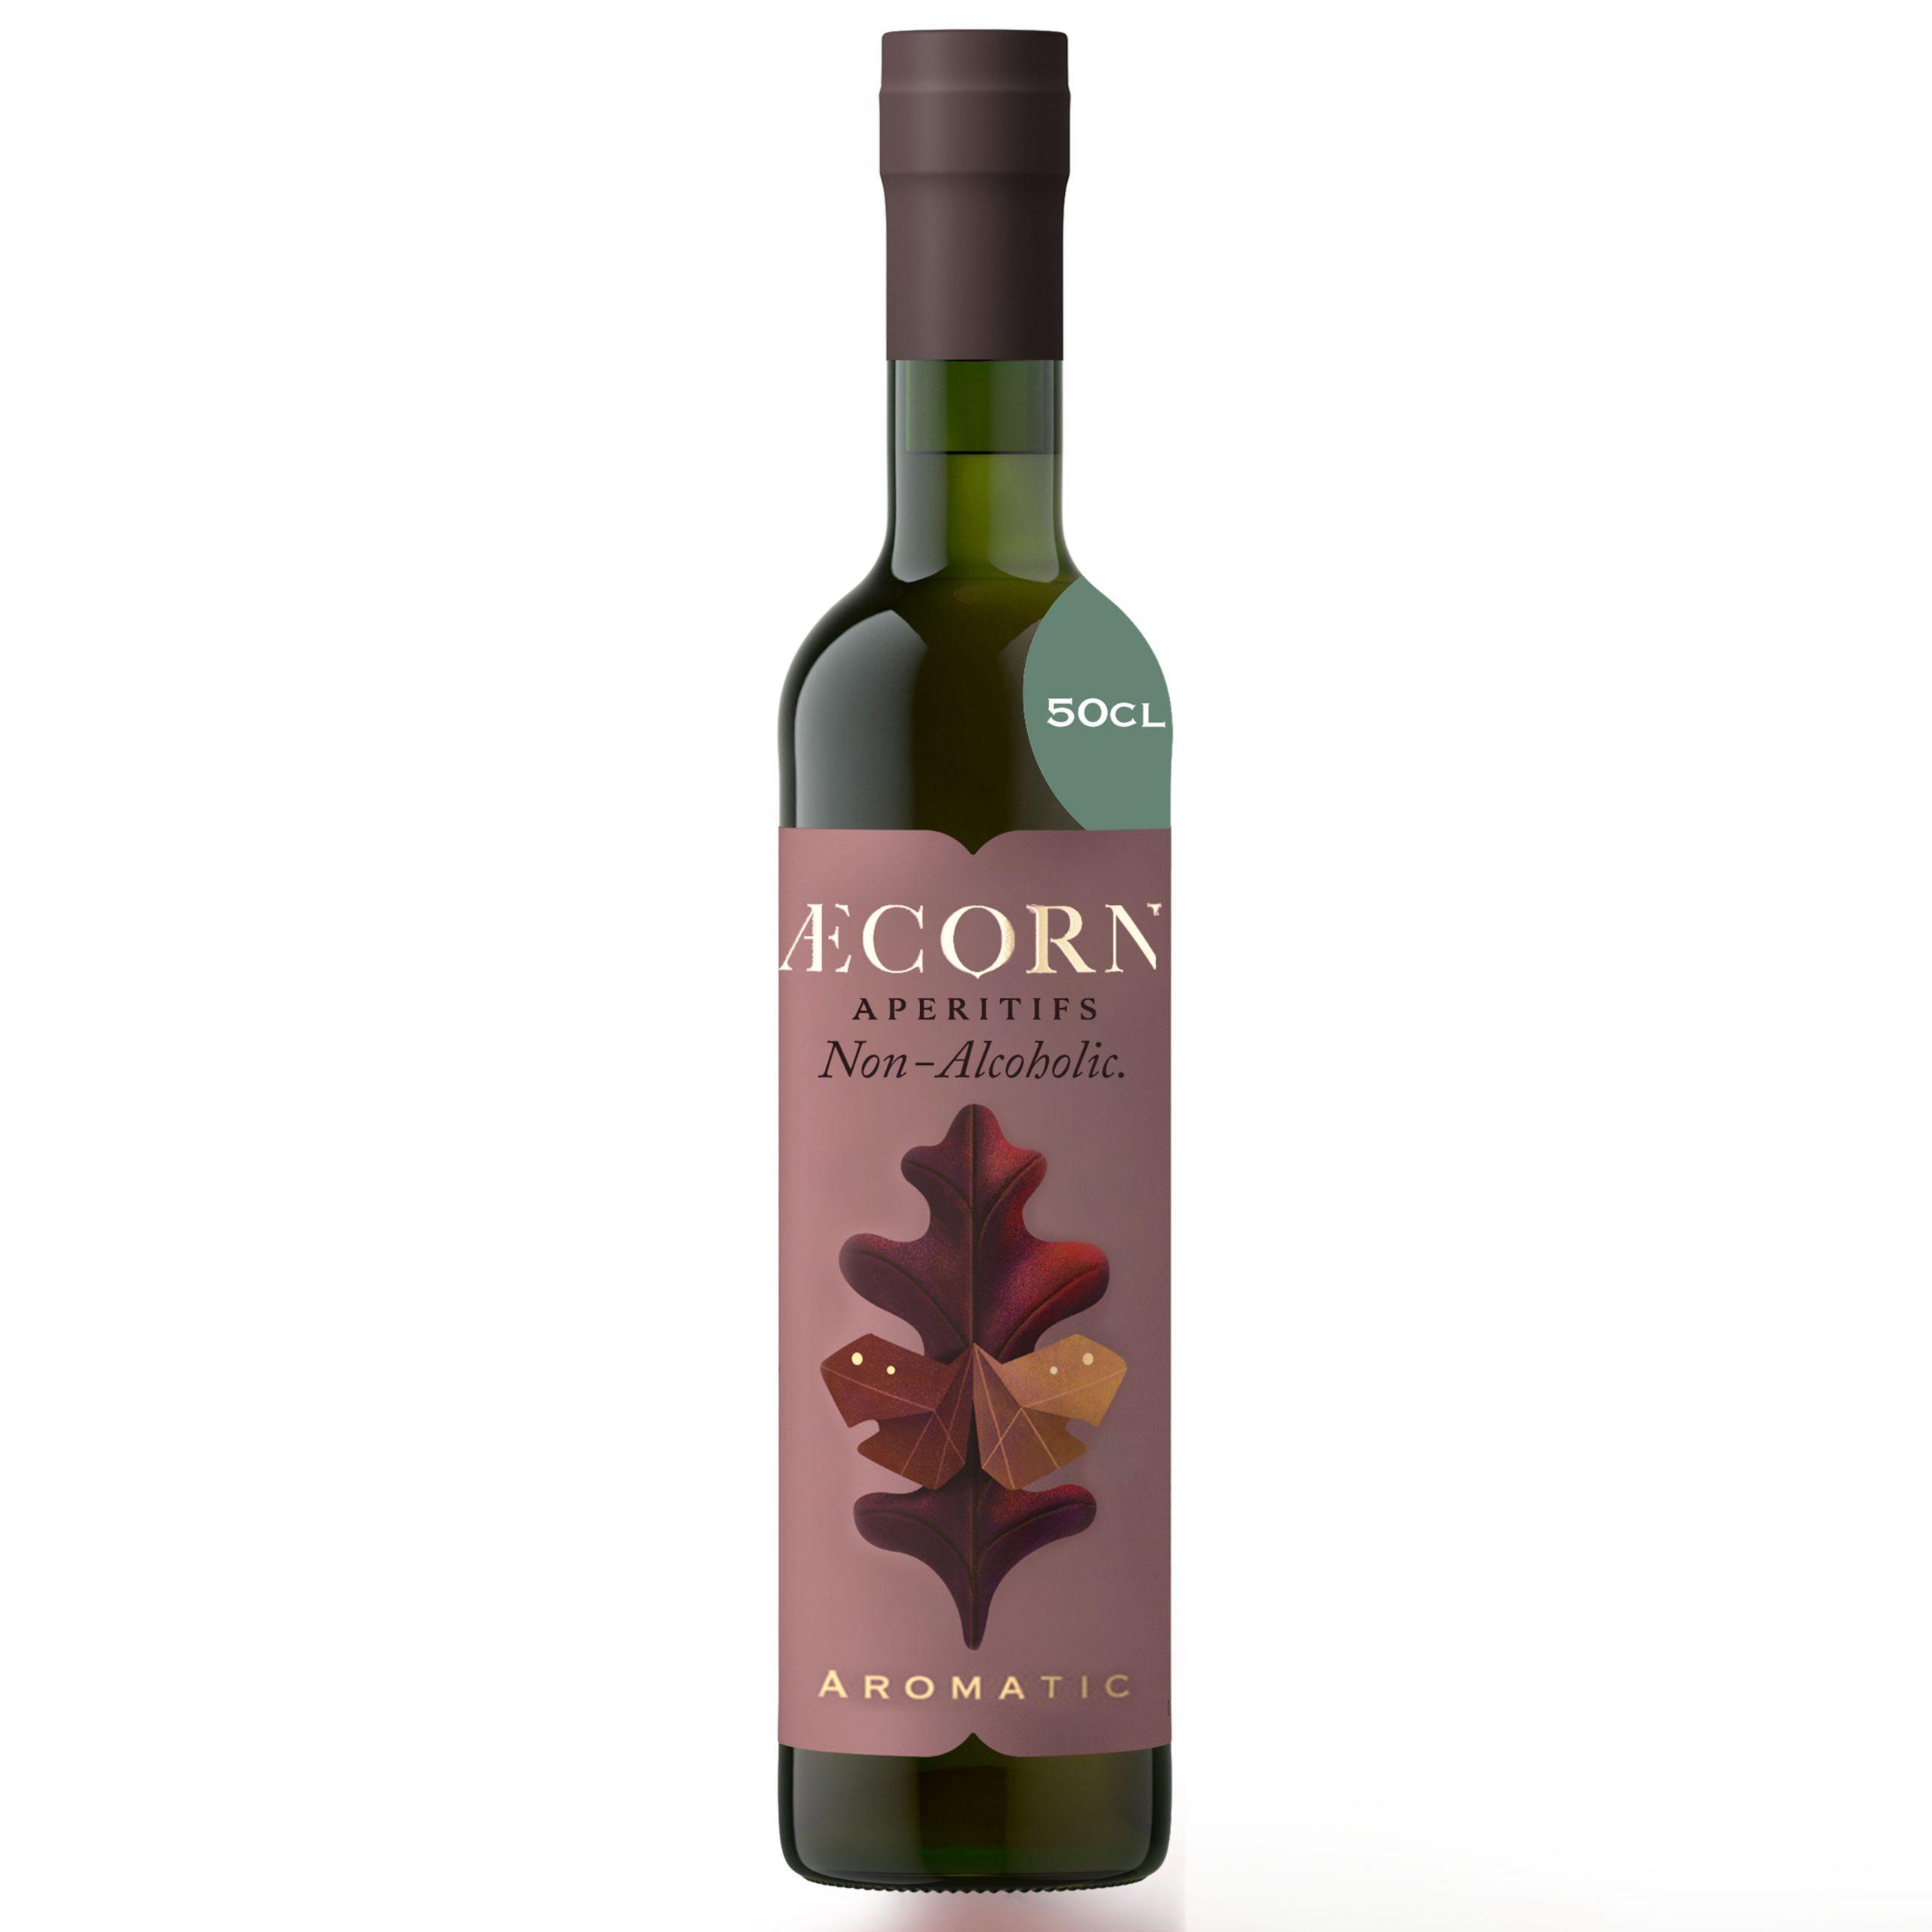 Aecorn Aromatic